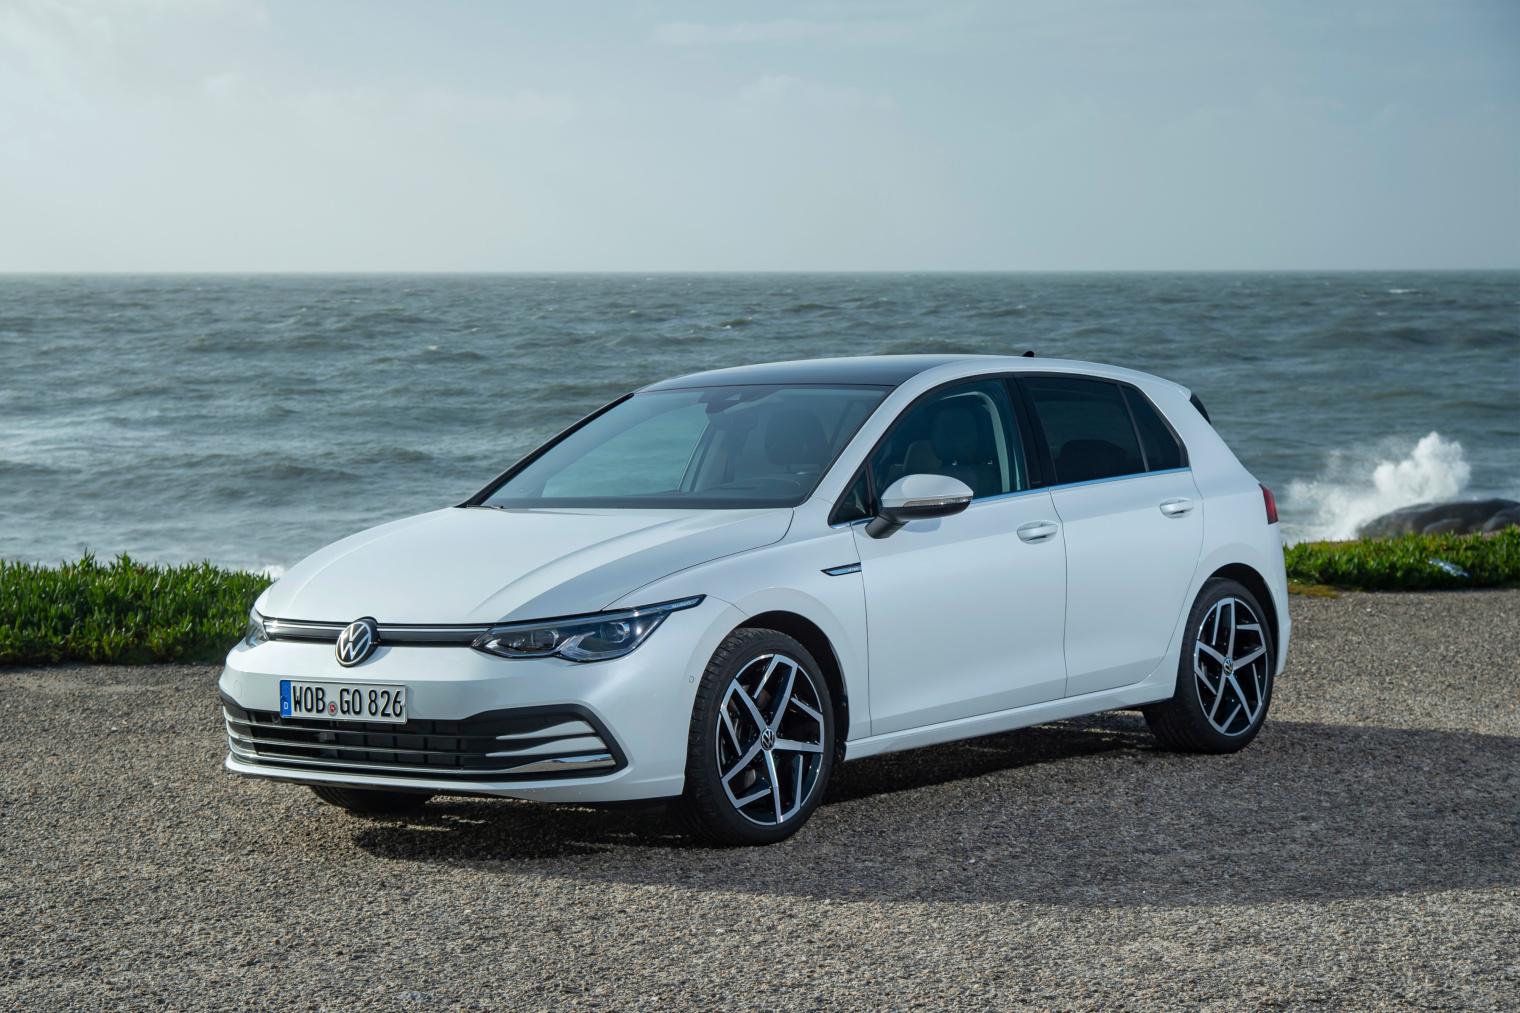 Esterni nuova Volkswagen Golf